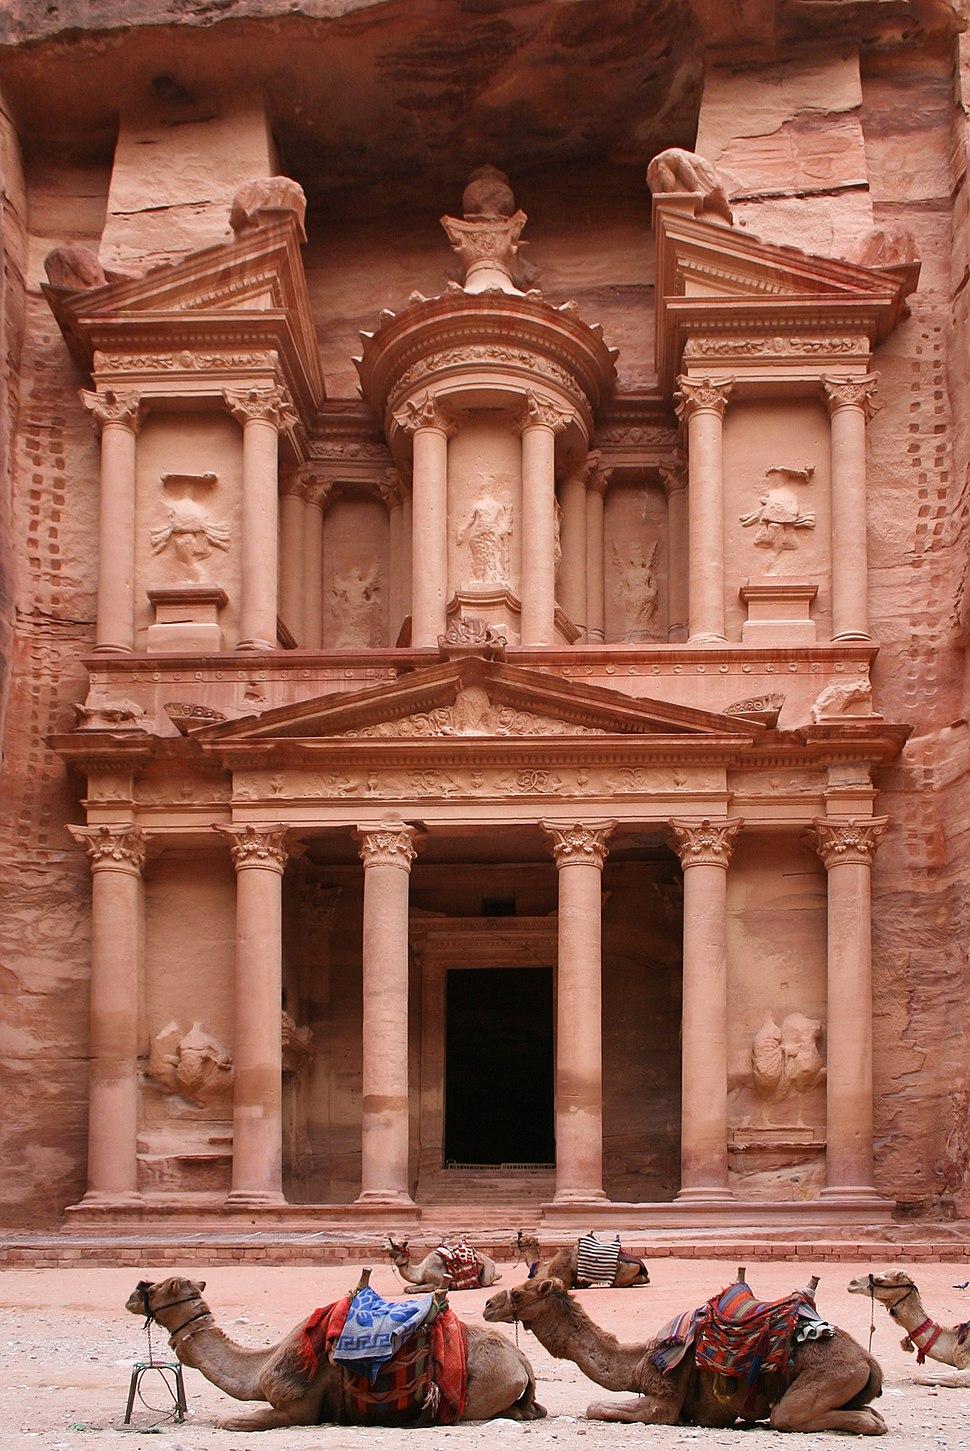 Al Khazneh Petra edit 2 (cropped)